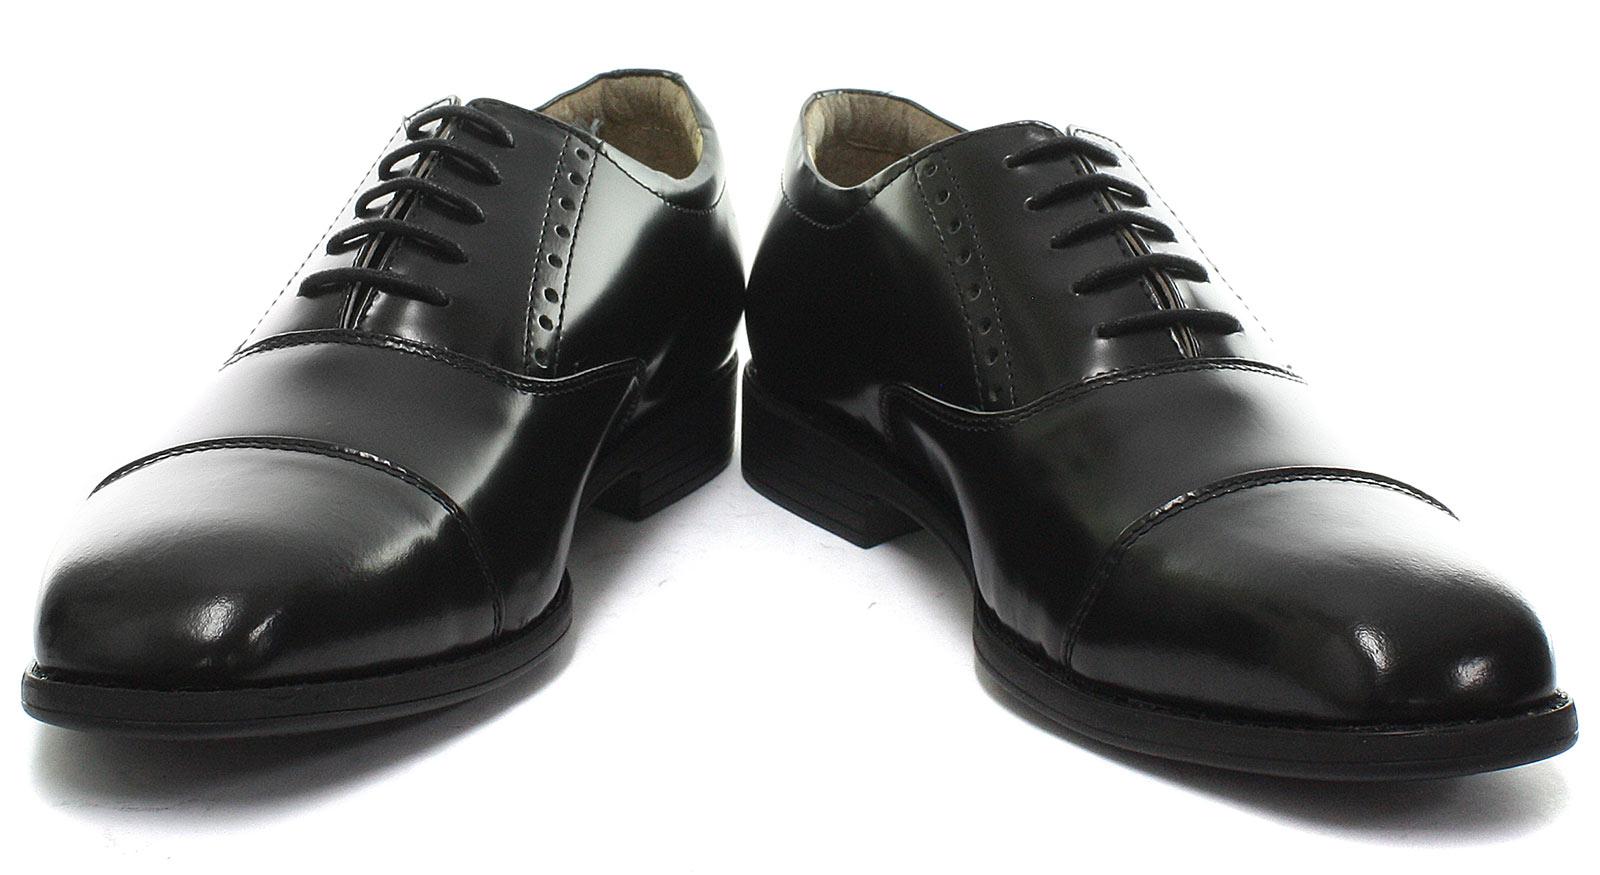 New-TredFlex-Hi-Shine-Toe-Cap-Oxford-Black-Mens-Lace-Up-Shoes-ALL-SIZES miniature 2